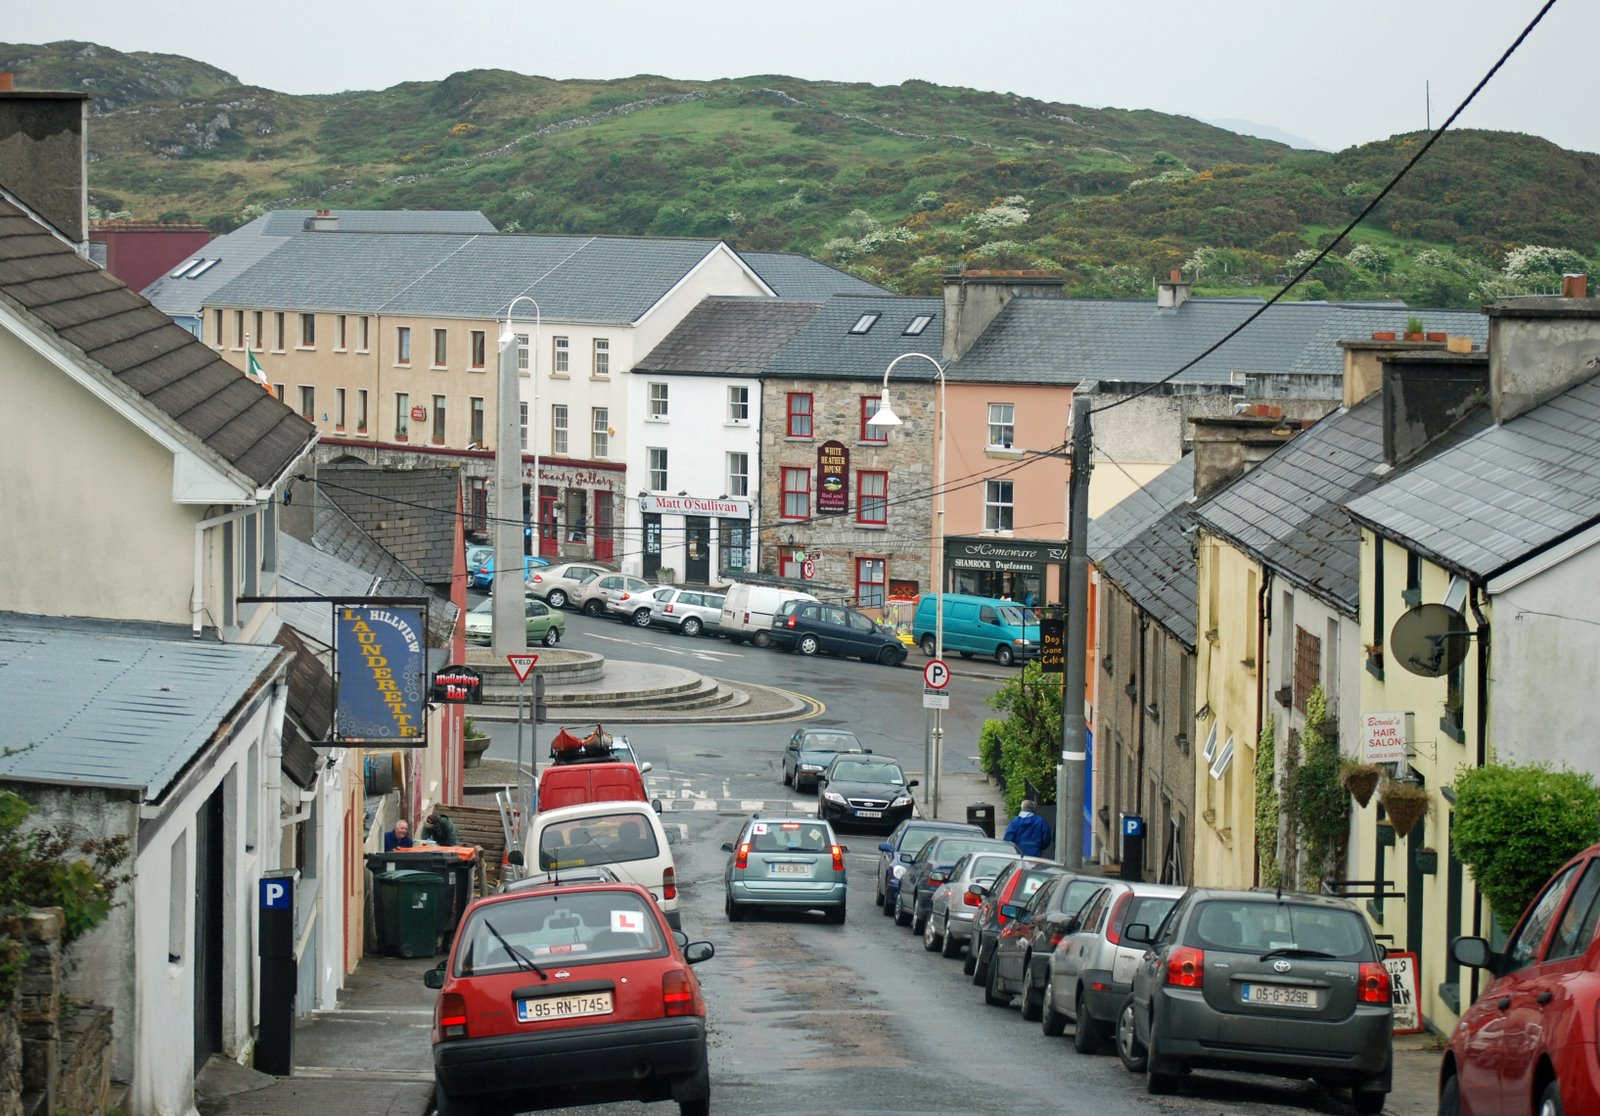 Cat Wall Murals Rambling Traveler Clifden In County Galway Ireland